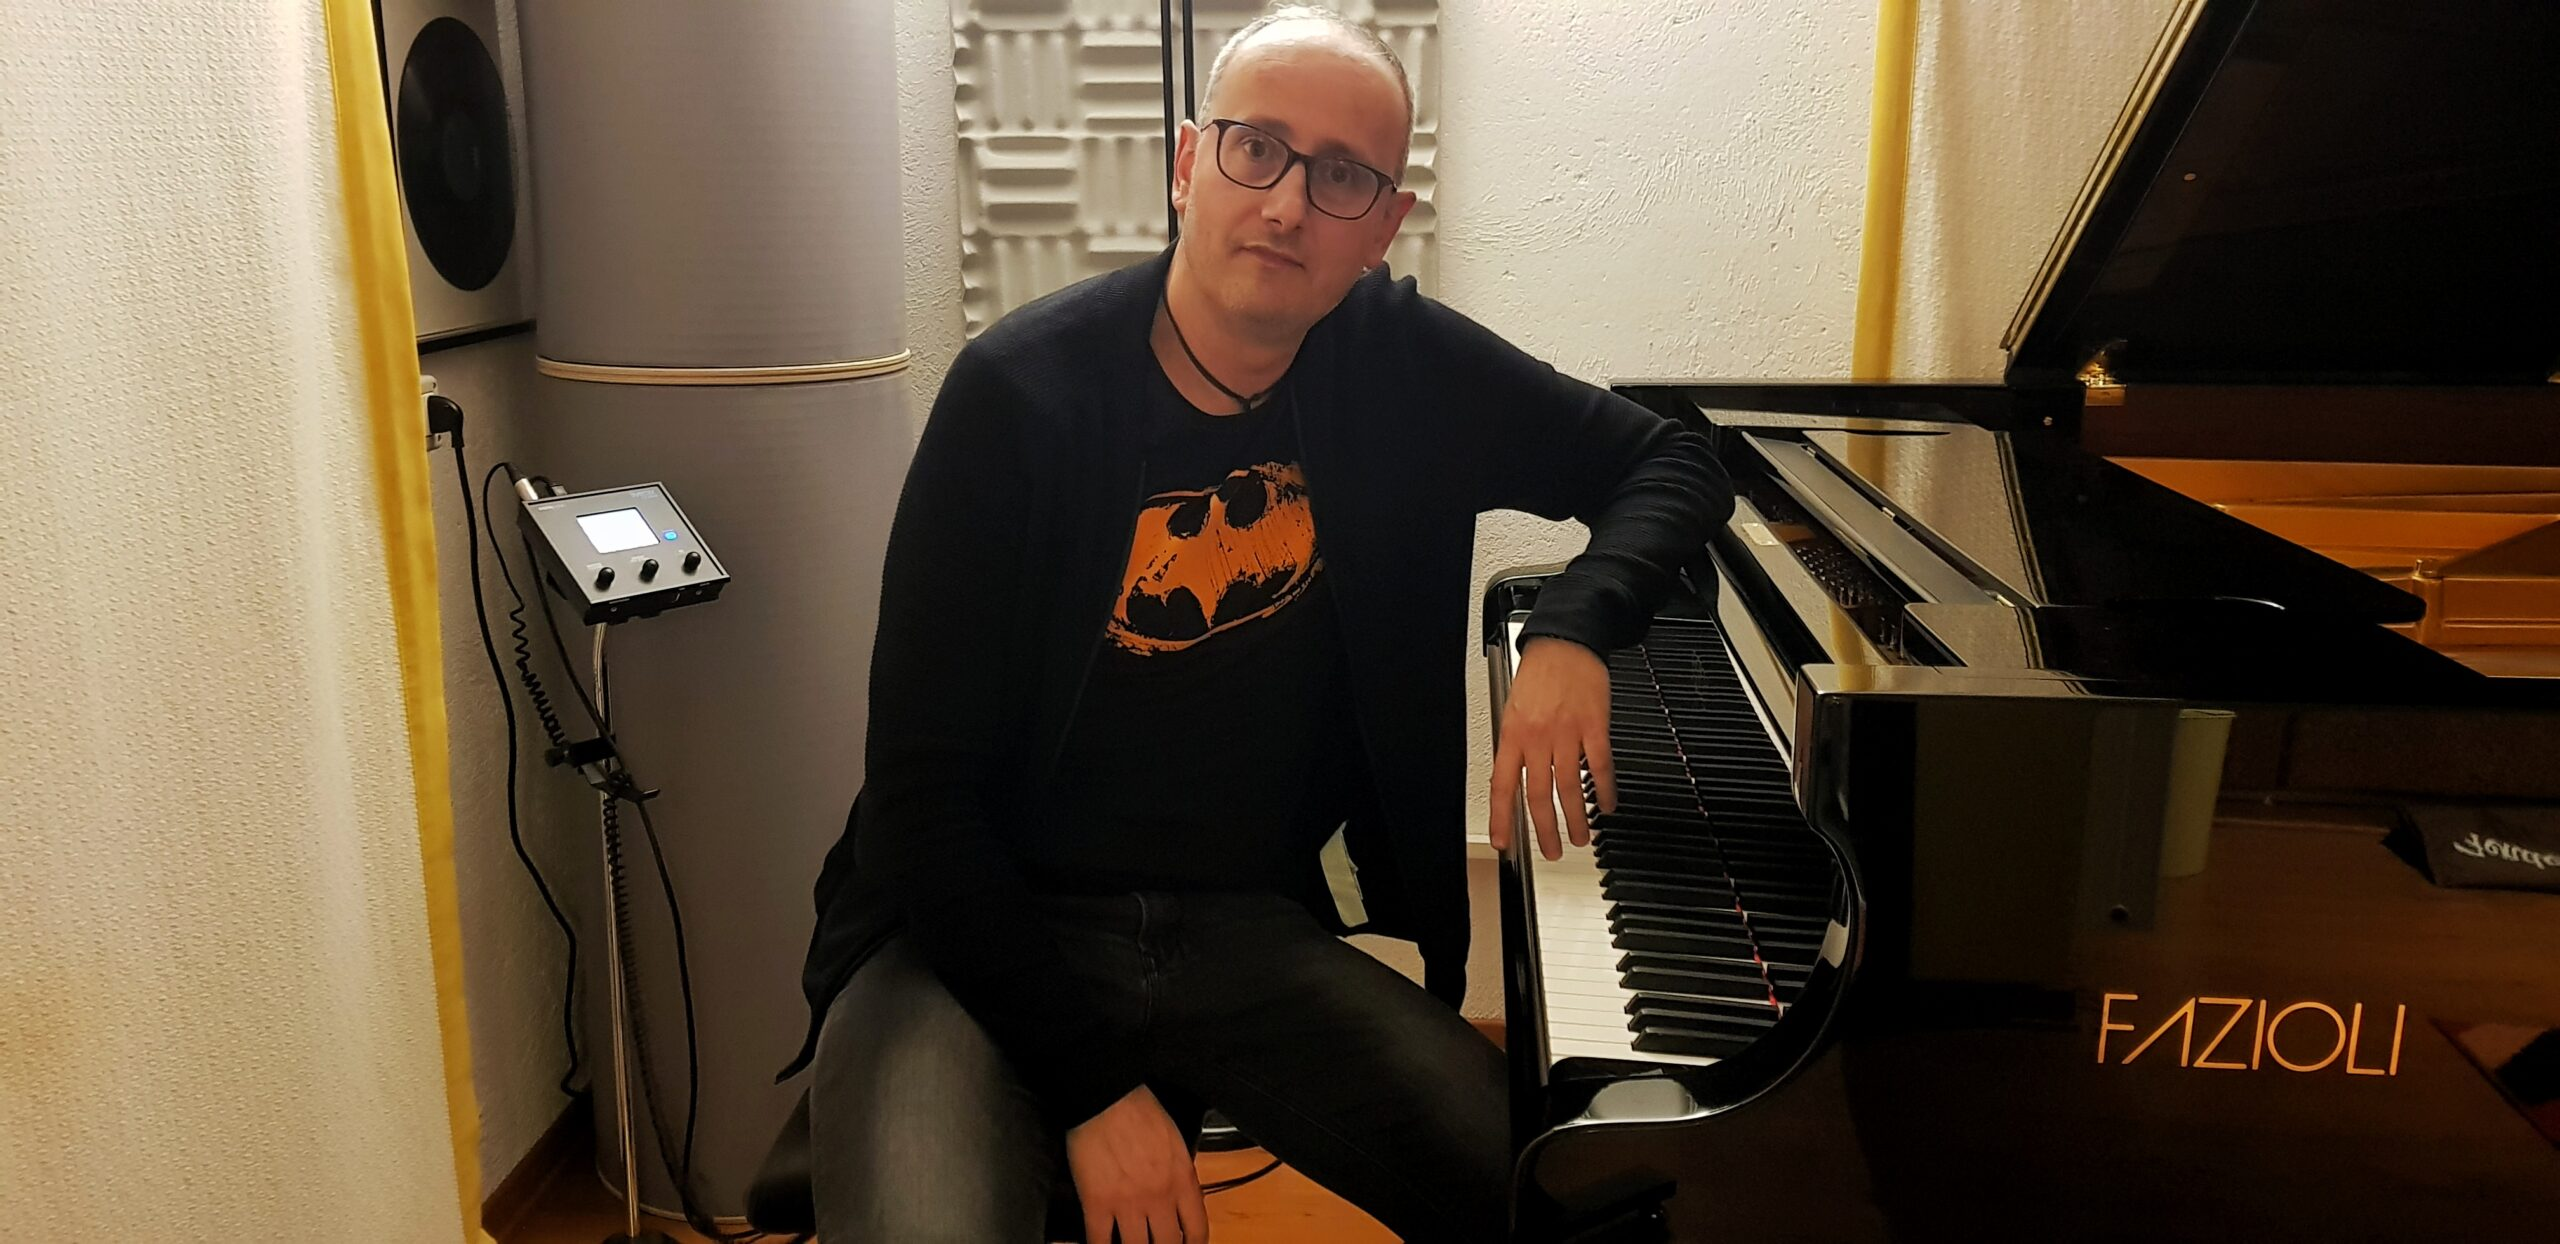 Pasquale Stafano pianist composer